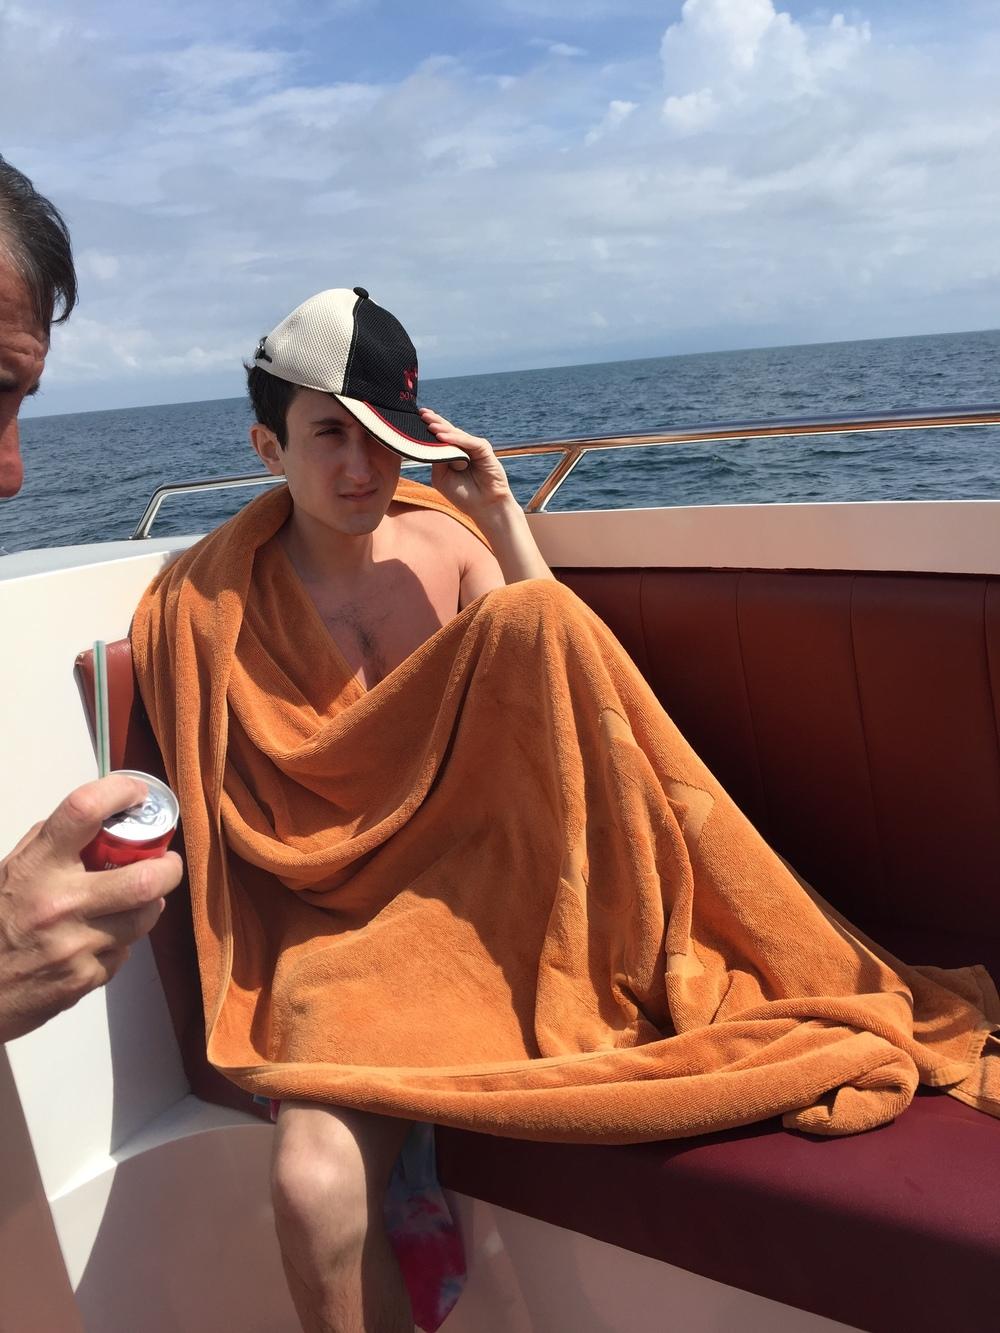 Nursing his sunburn